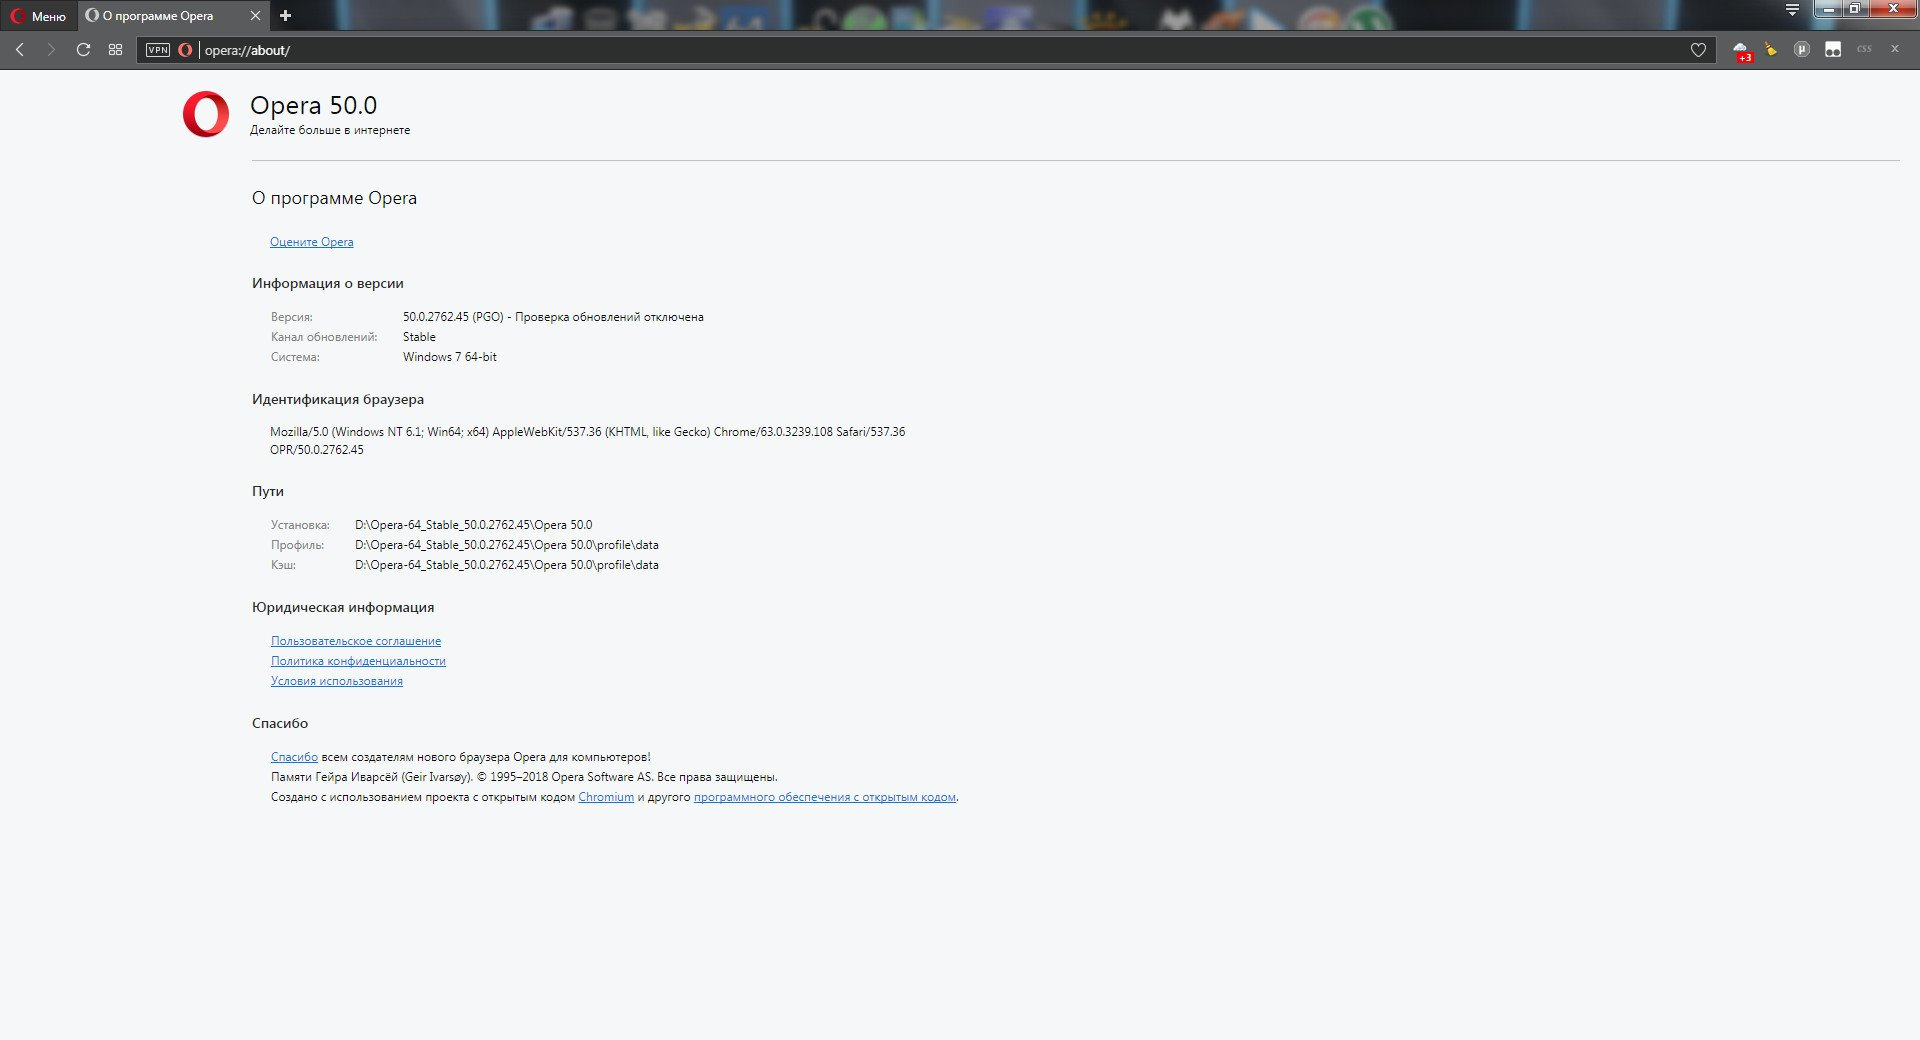 Opera 50.0.2762.67 Stable (2018) РС